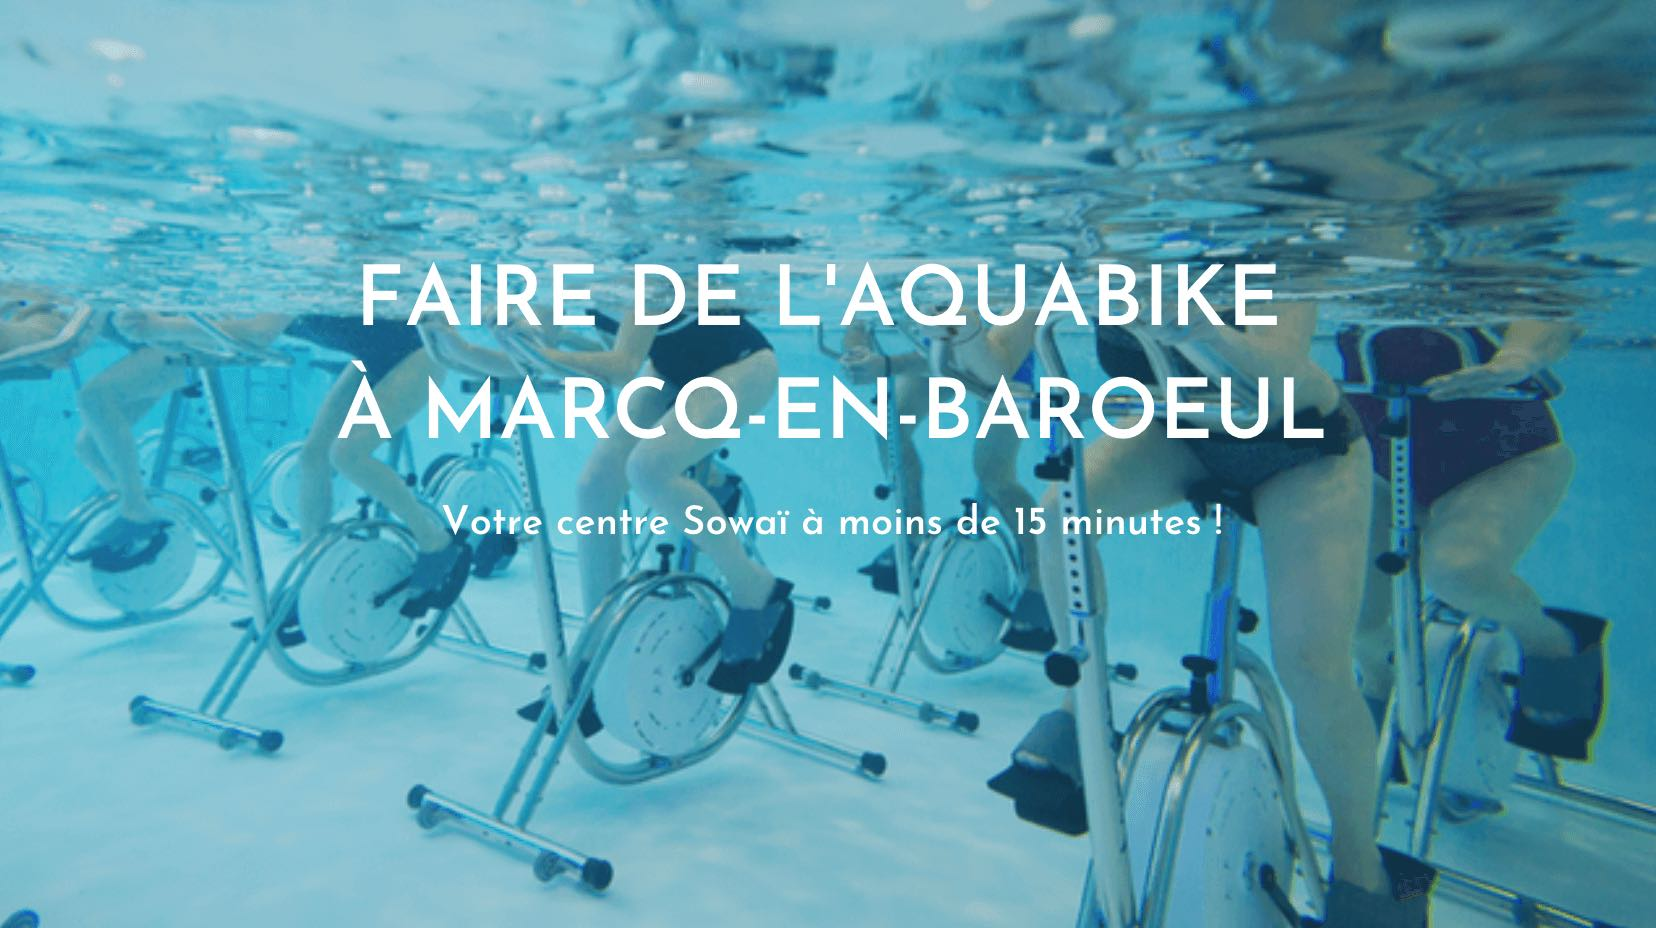 Faire de l'aquabike à moins de 15 minutes de Marcq-en-Baroeul, c'est possible avec votre centre Sowaï !